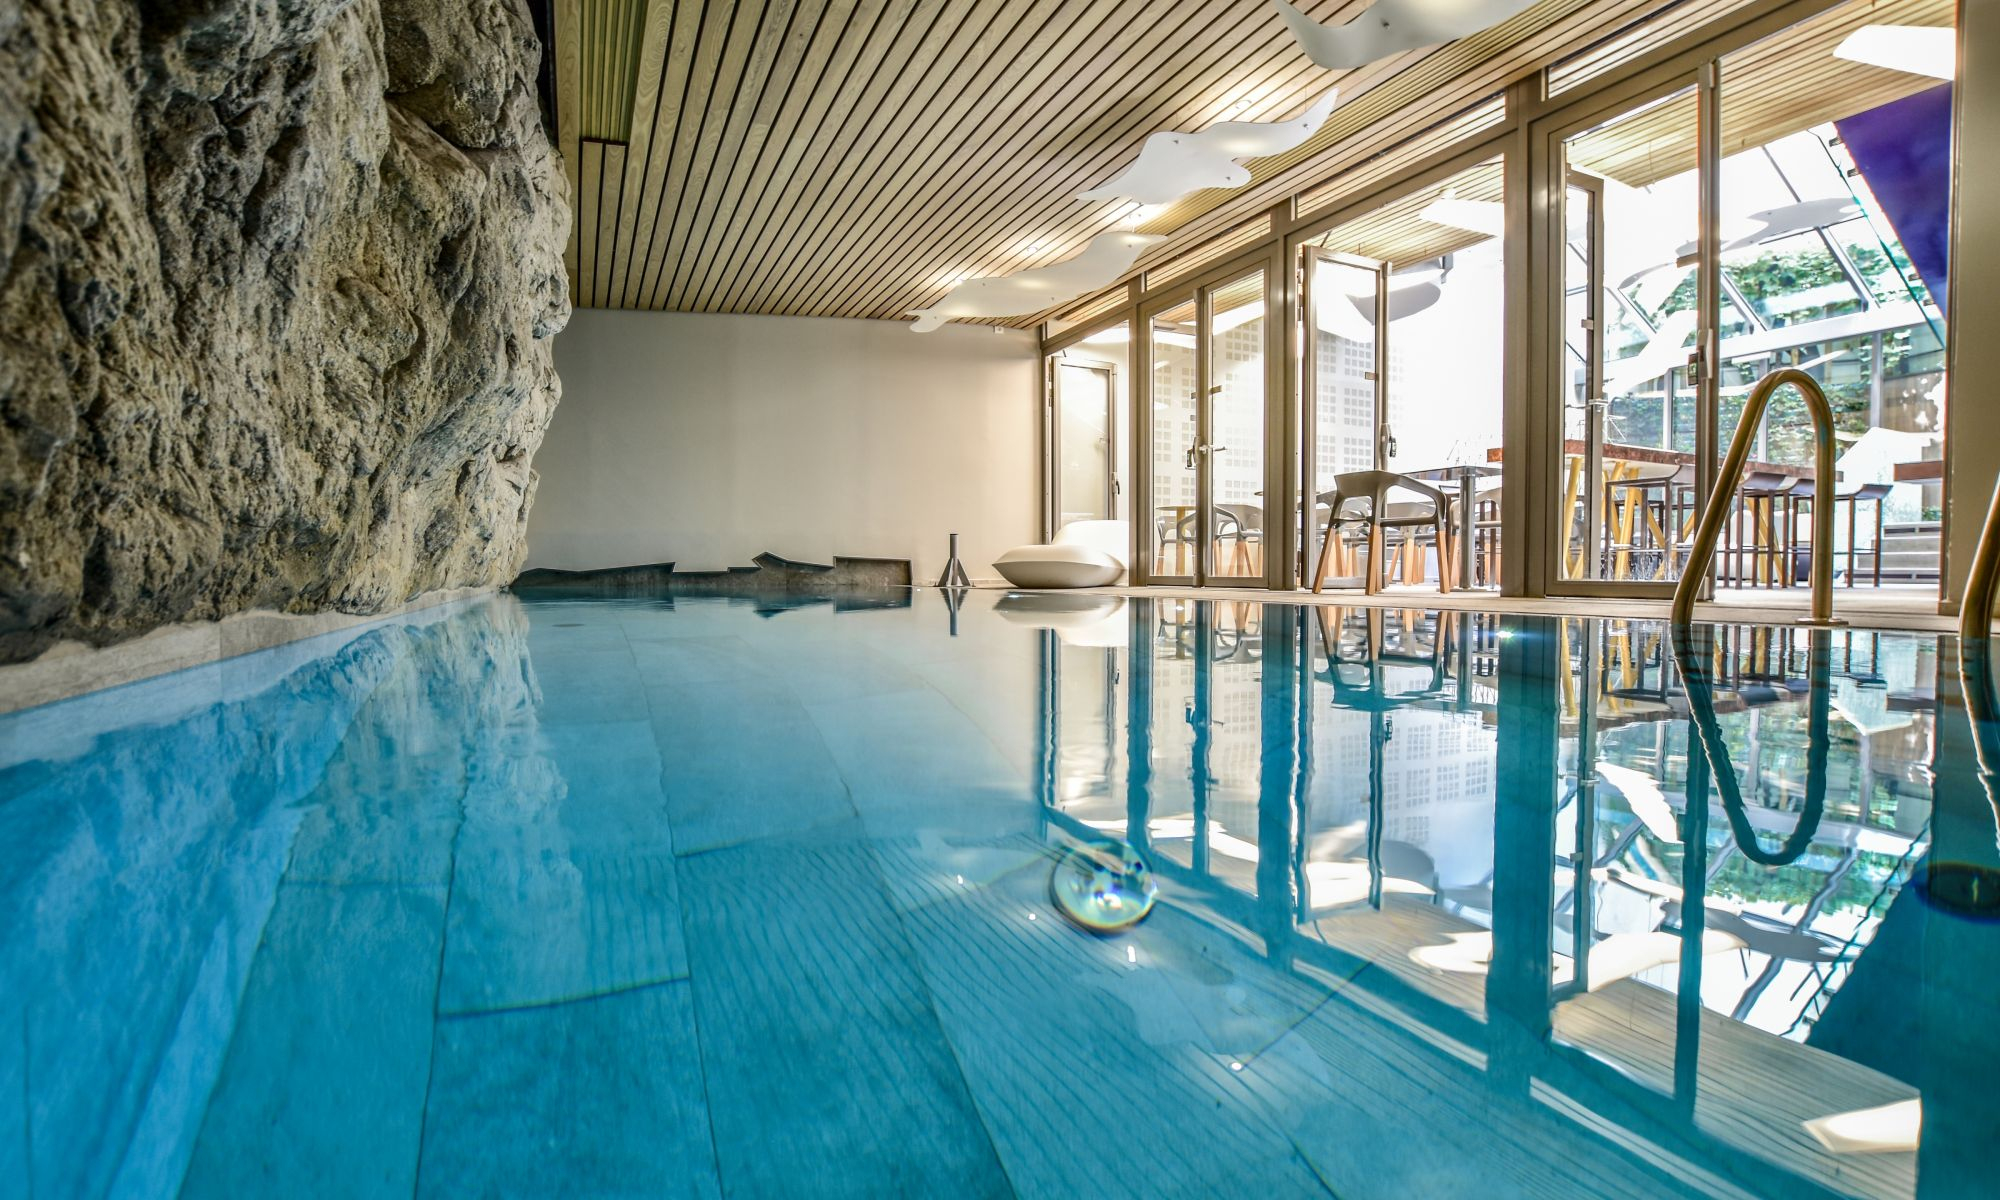 Find A Nice Hotel With Swimming Pool In Paris - Hotel 4* B55 ... avec Hotel Avec Piscine Paris